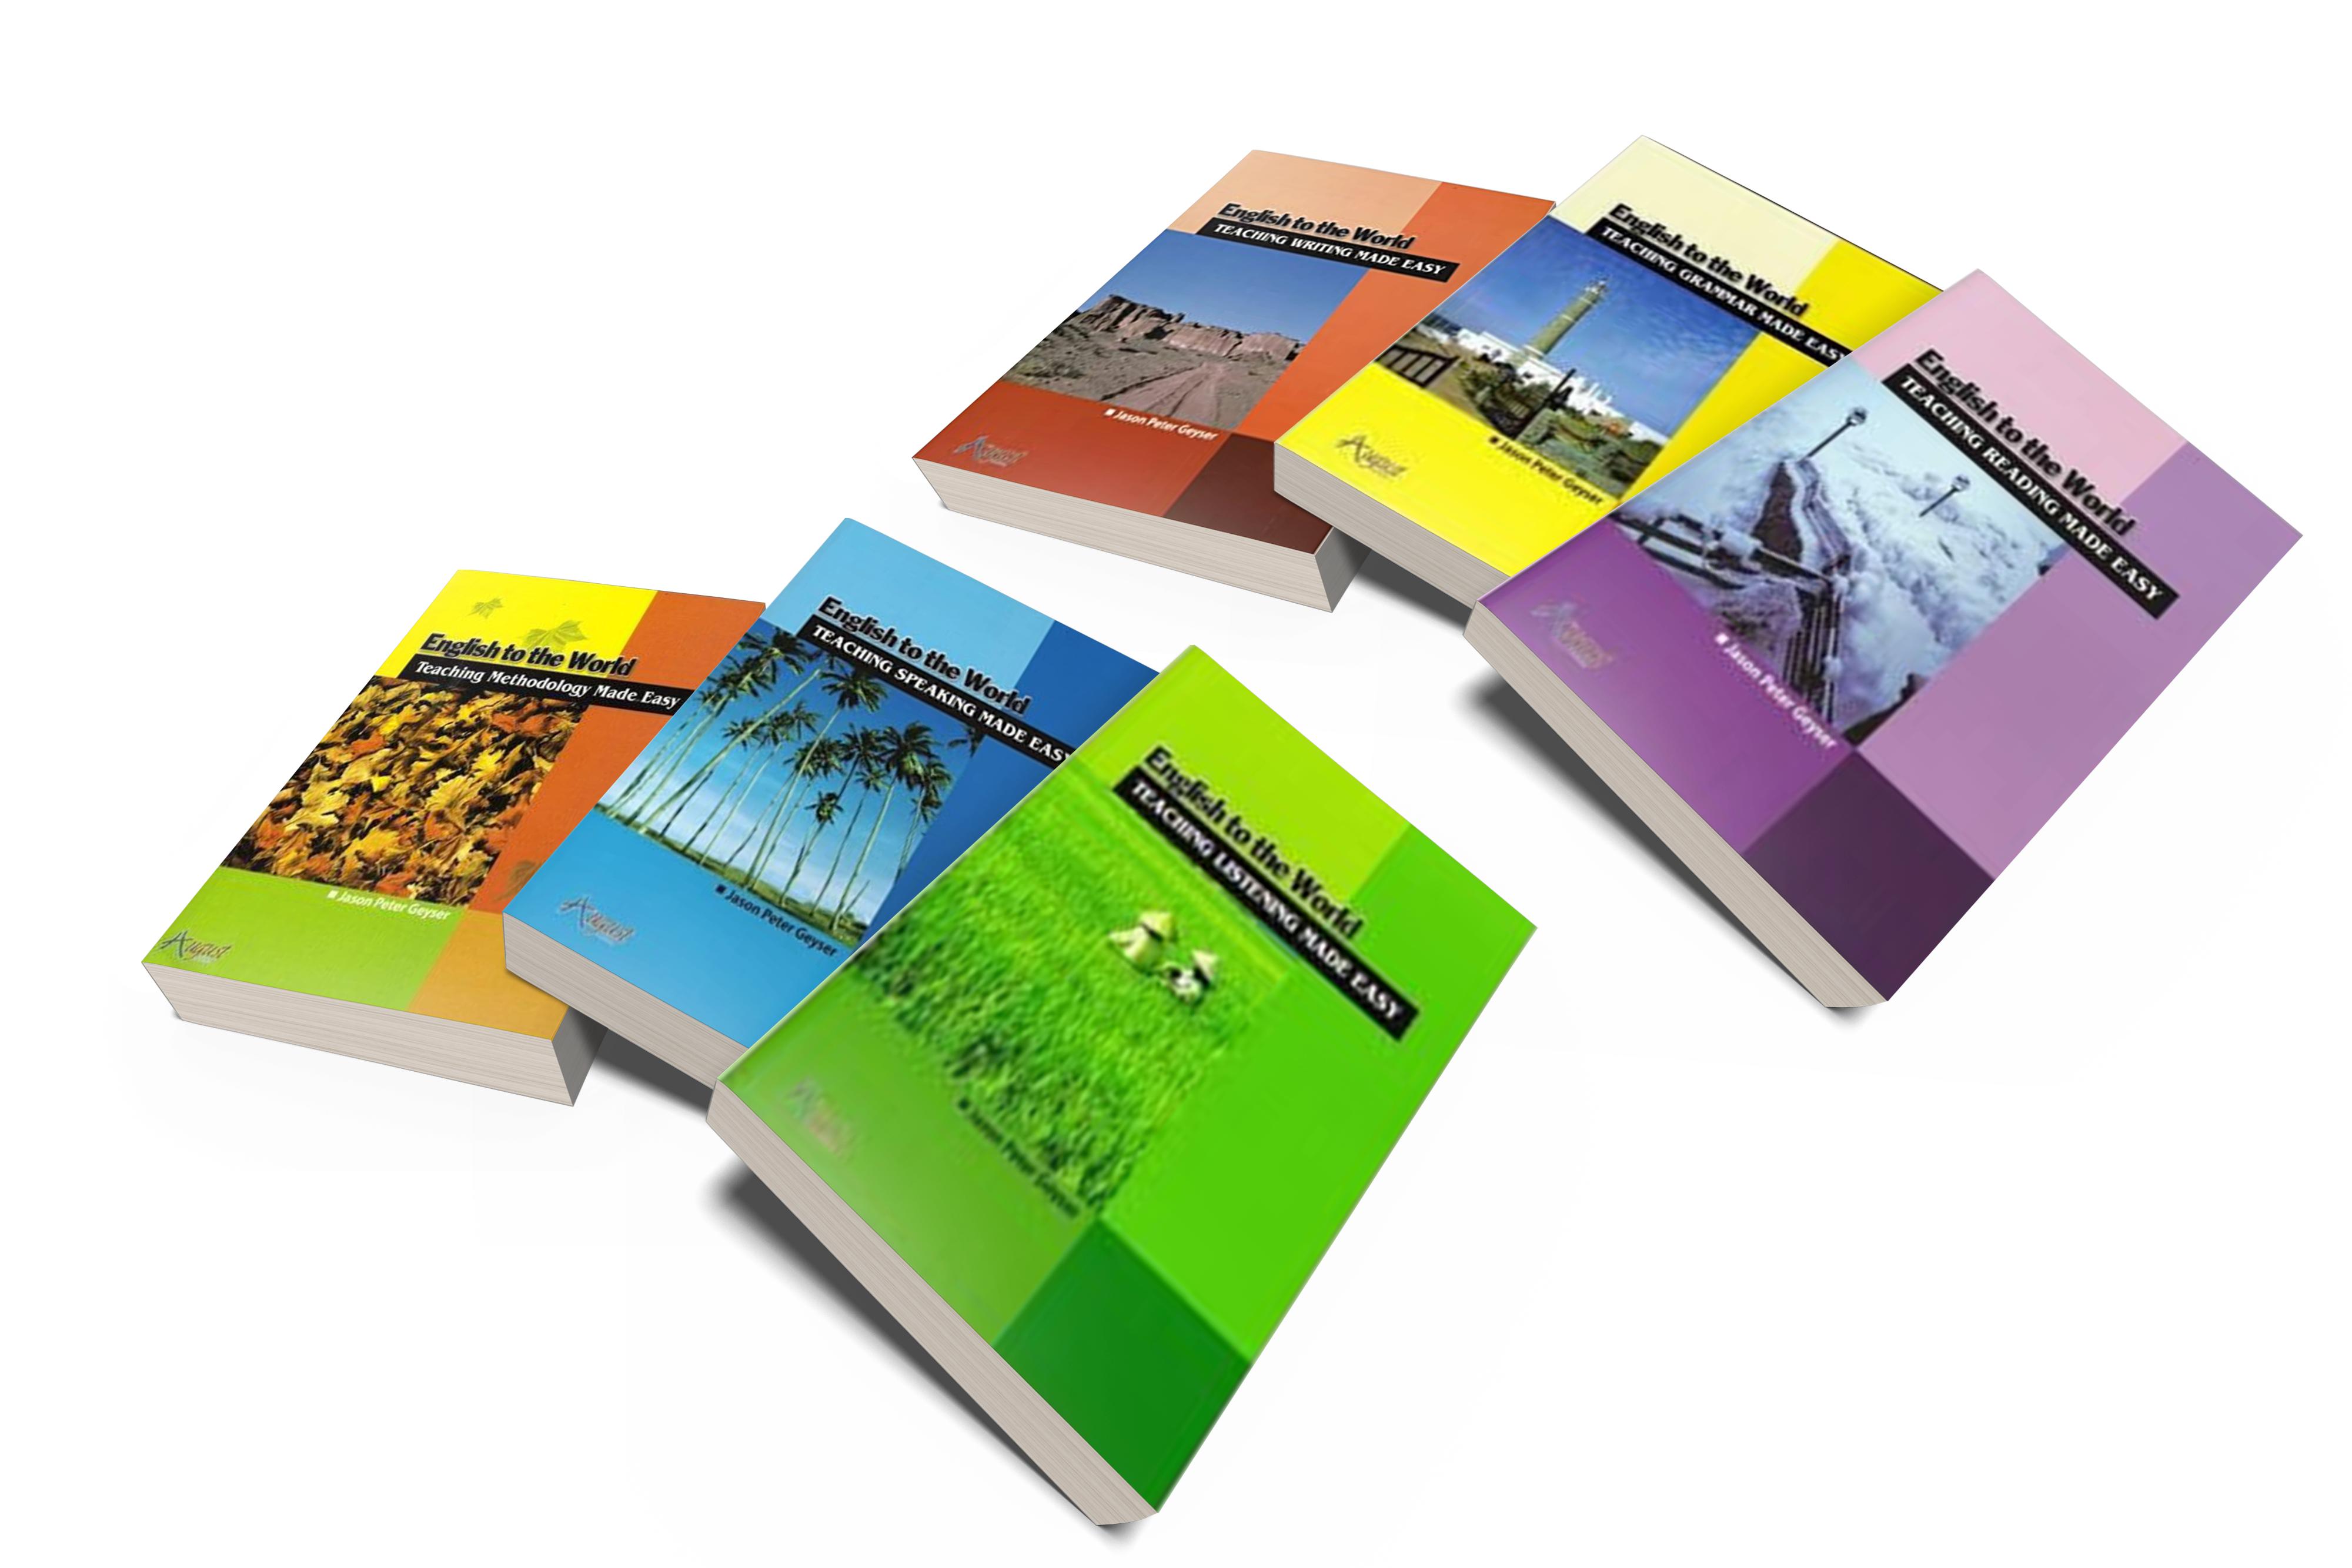 TEFL Textbooks for TEFL Solutions